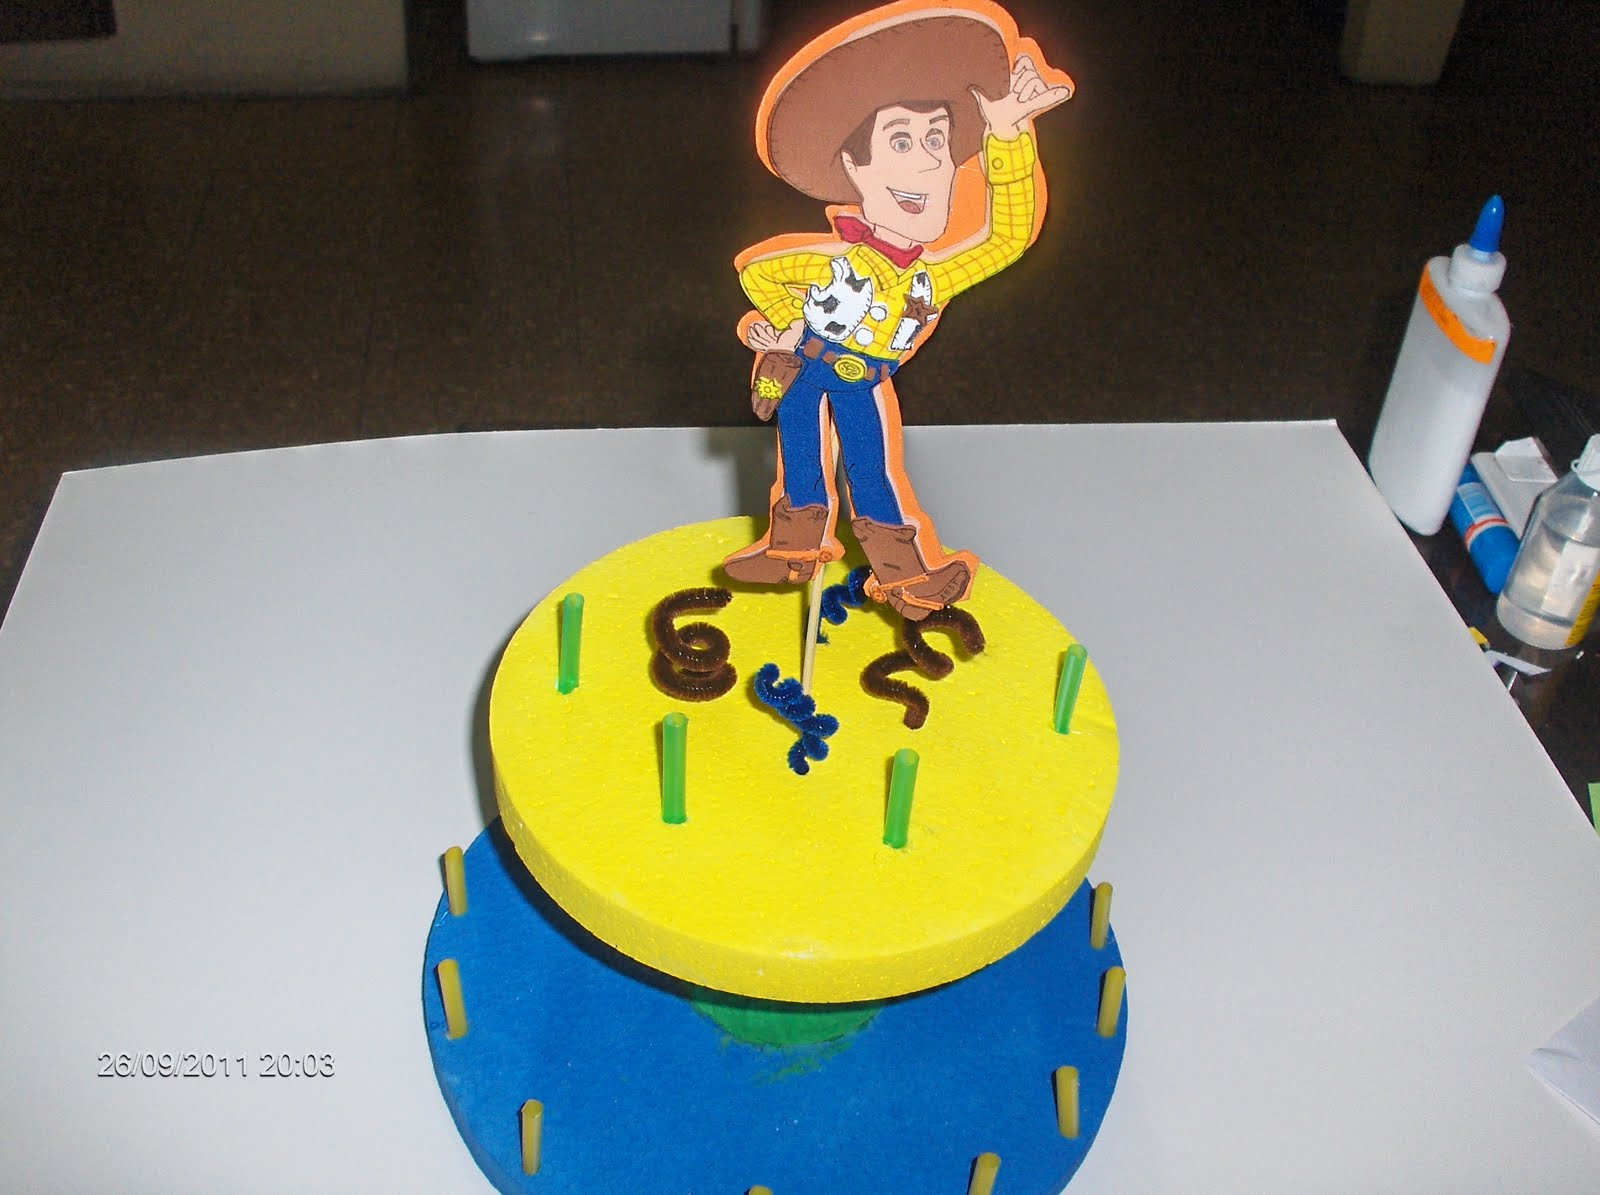 Ericka Manualidades: Chupetera del Vaquero Woody de Toy Story